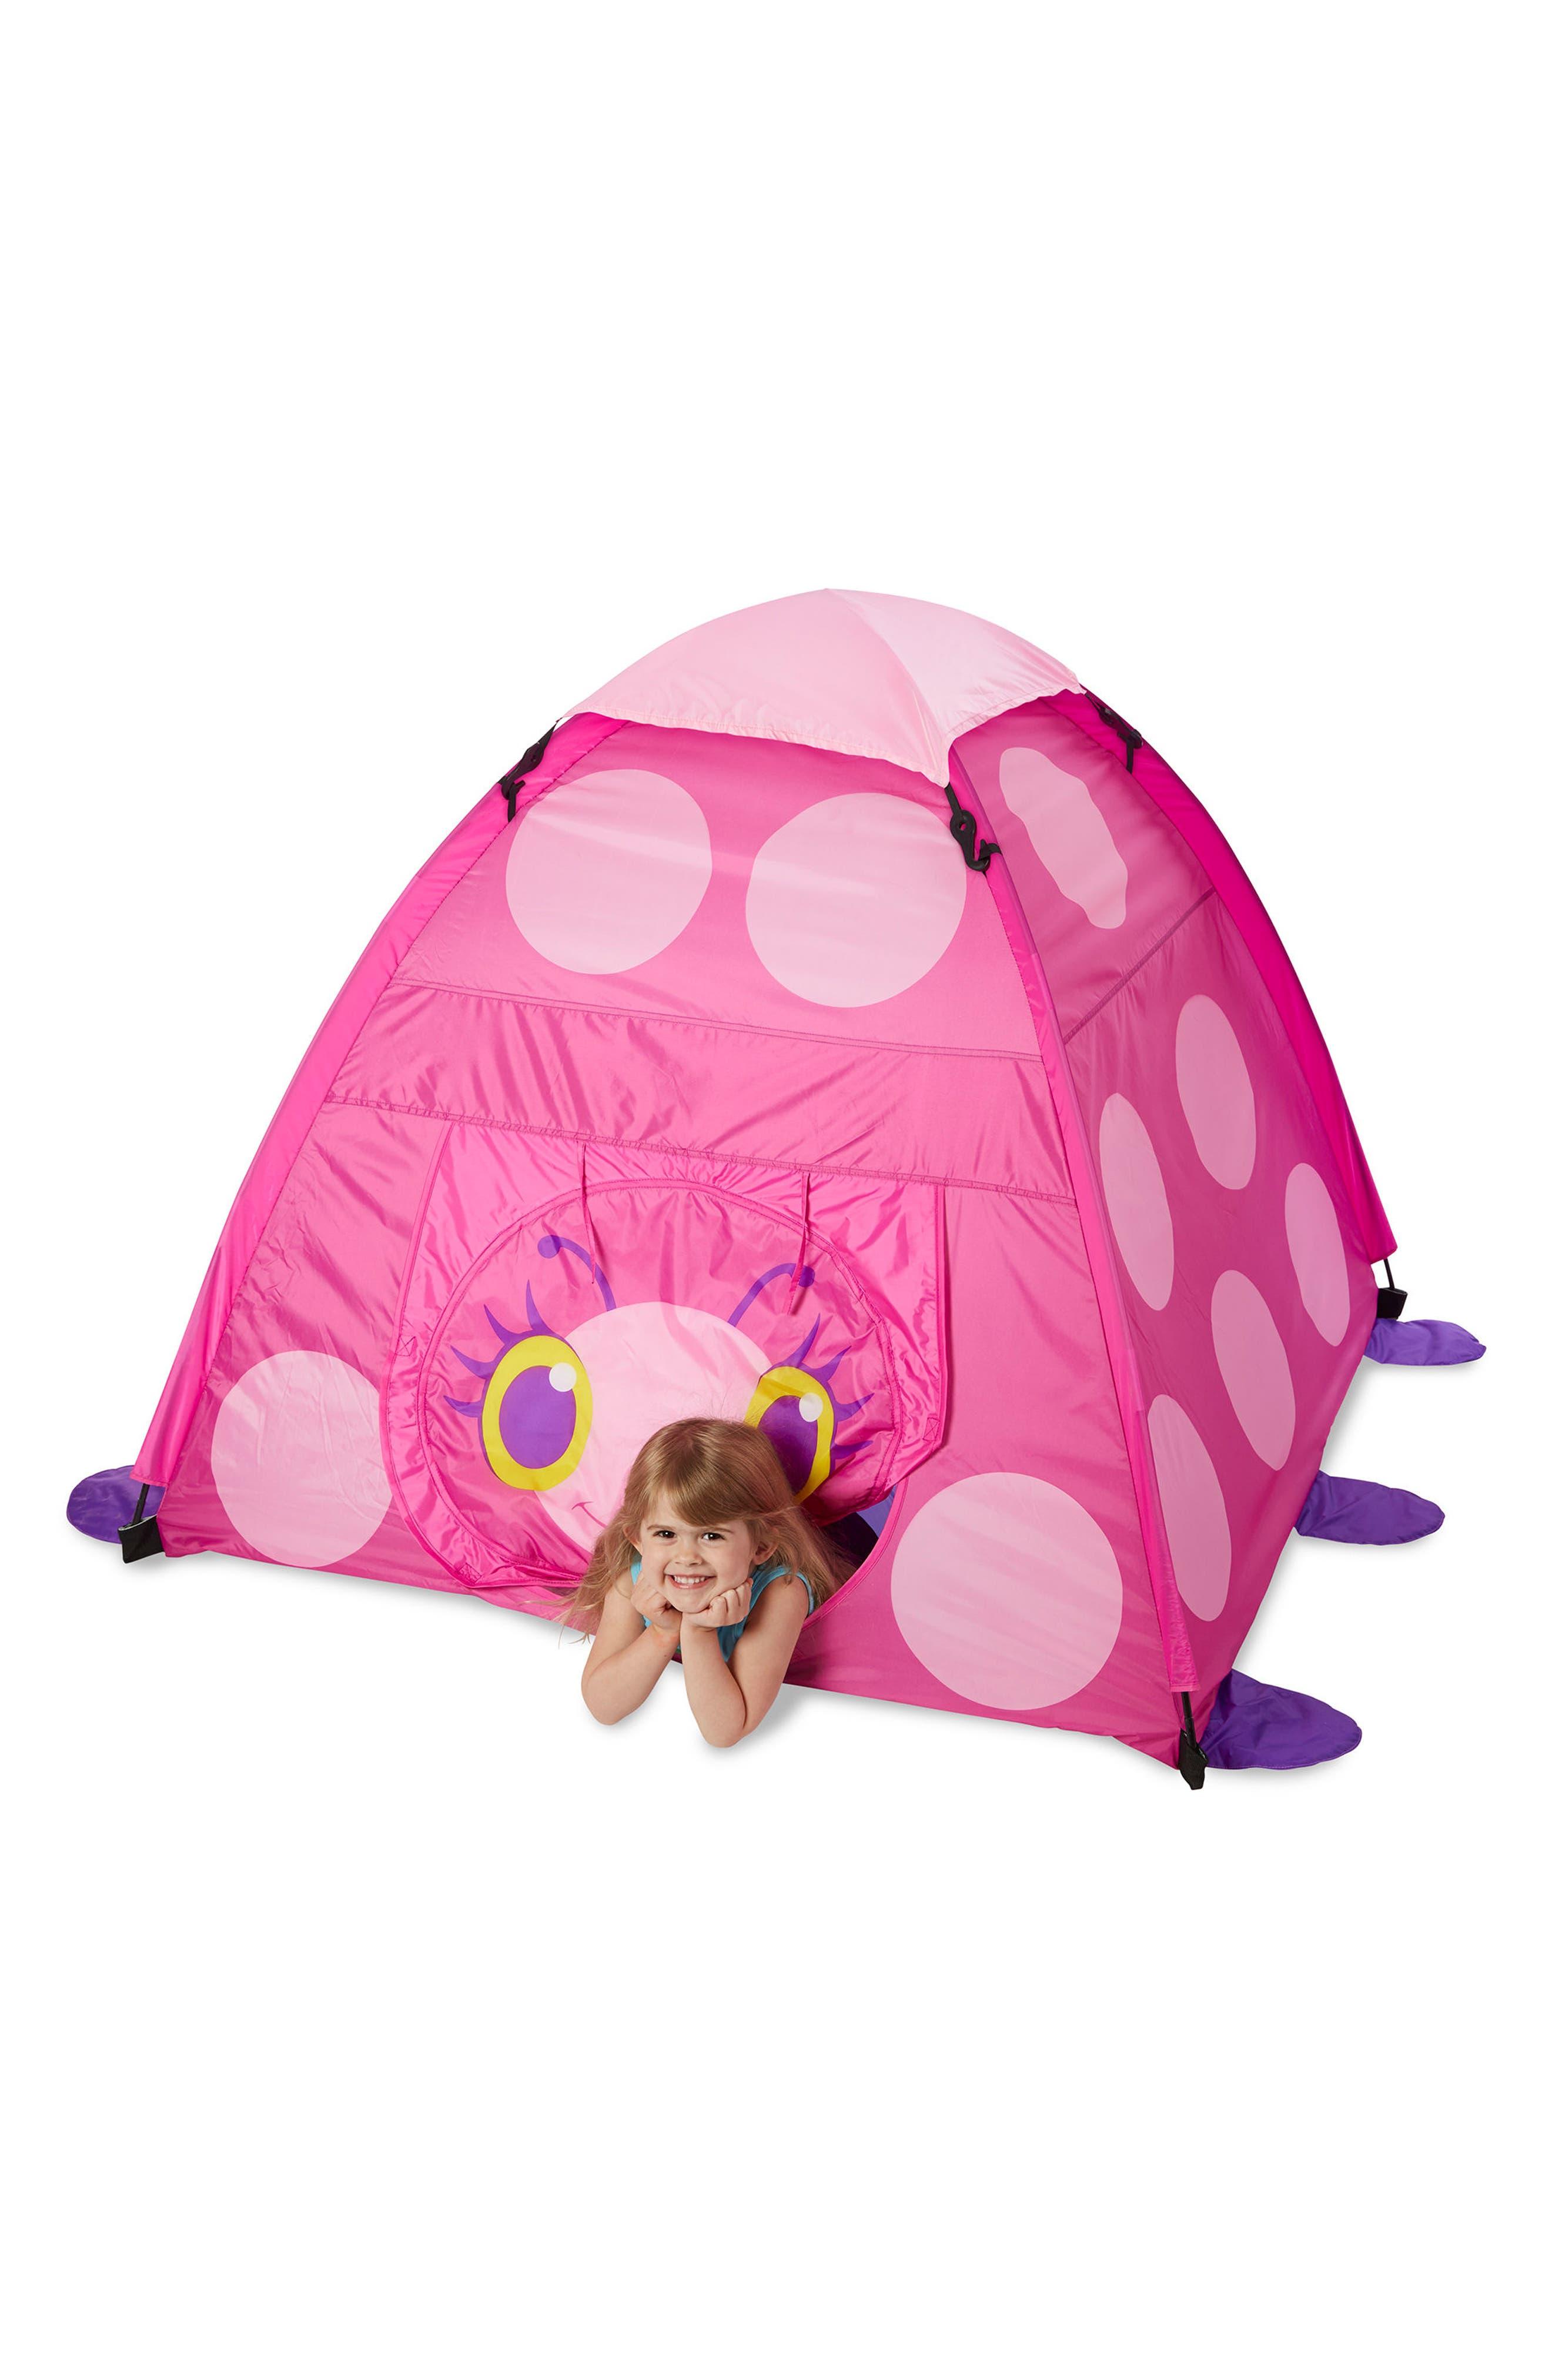 Trixie Ladybug Tent,                             Alternate thumbnail 4, color,                             650